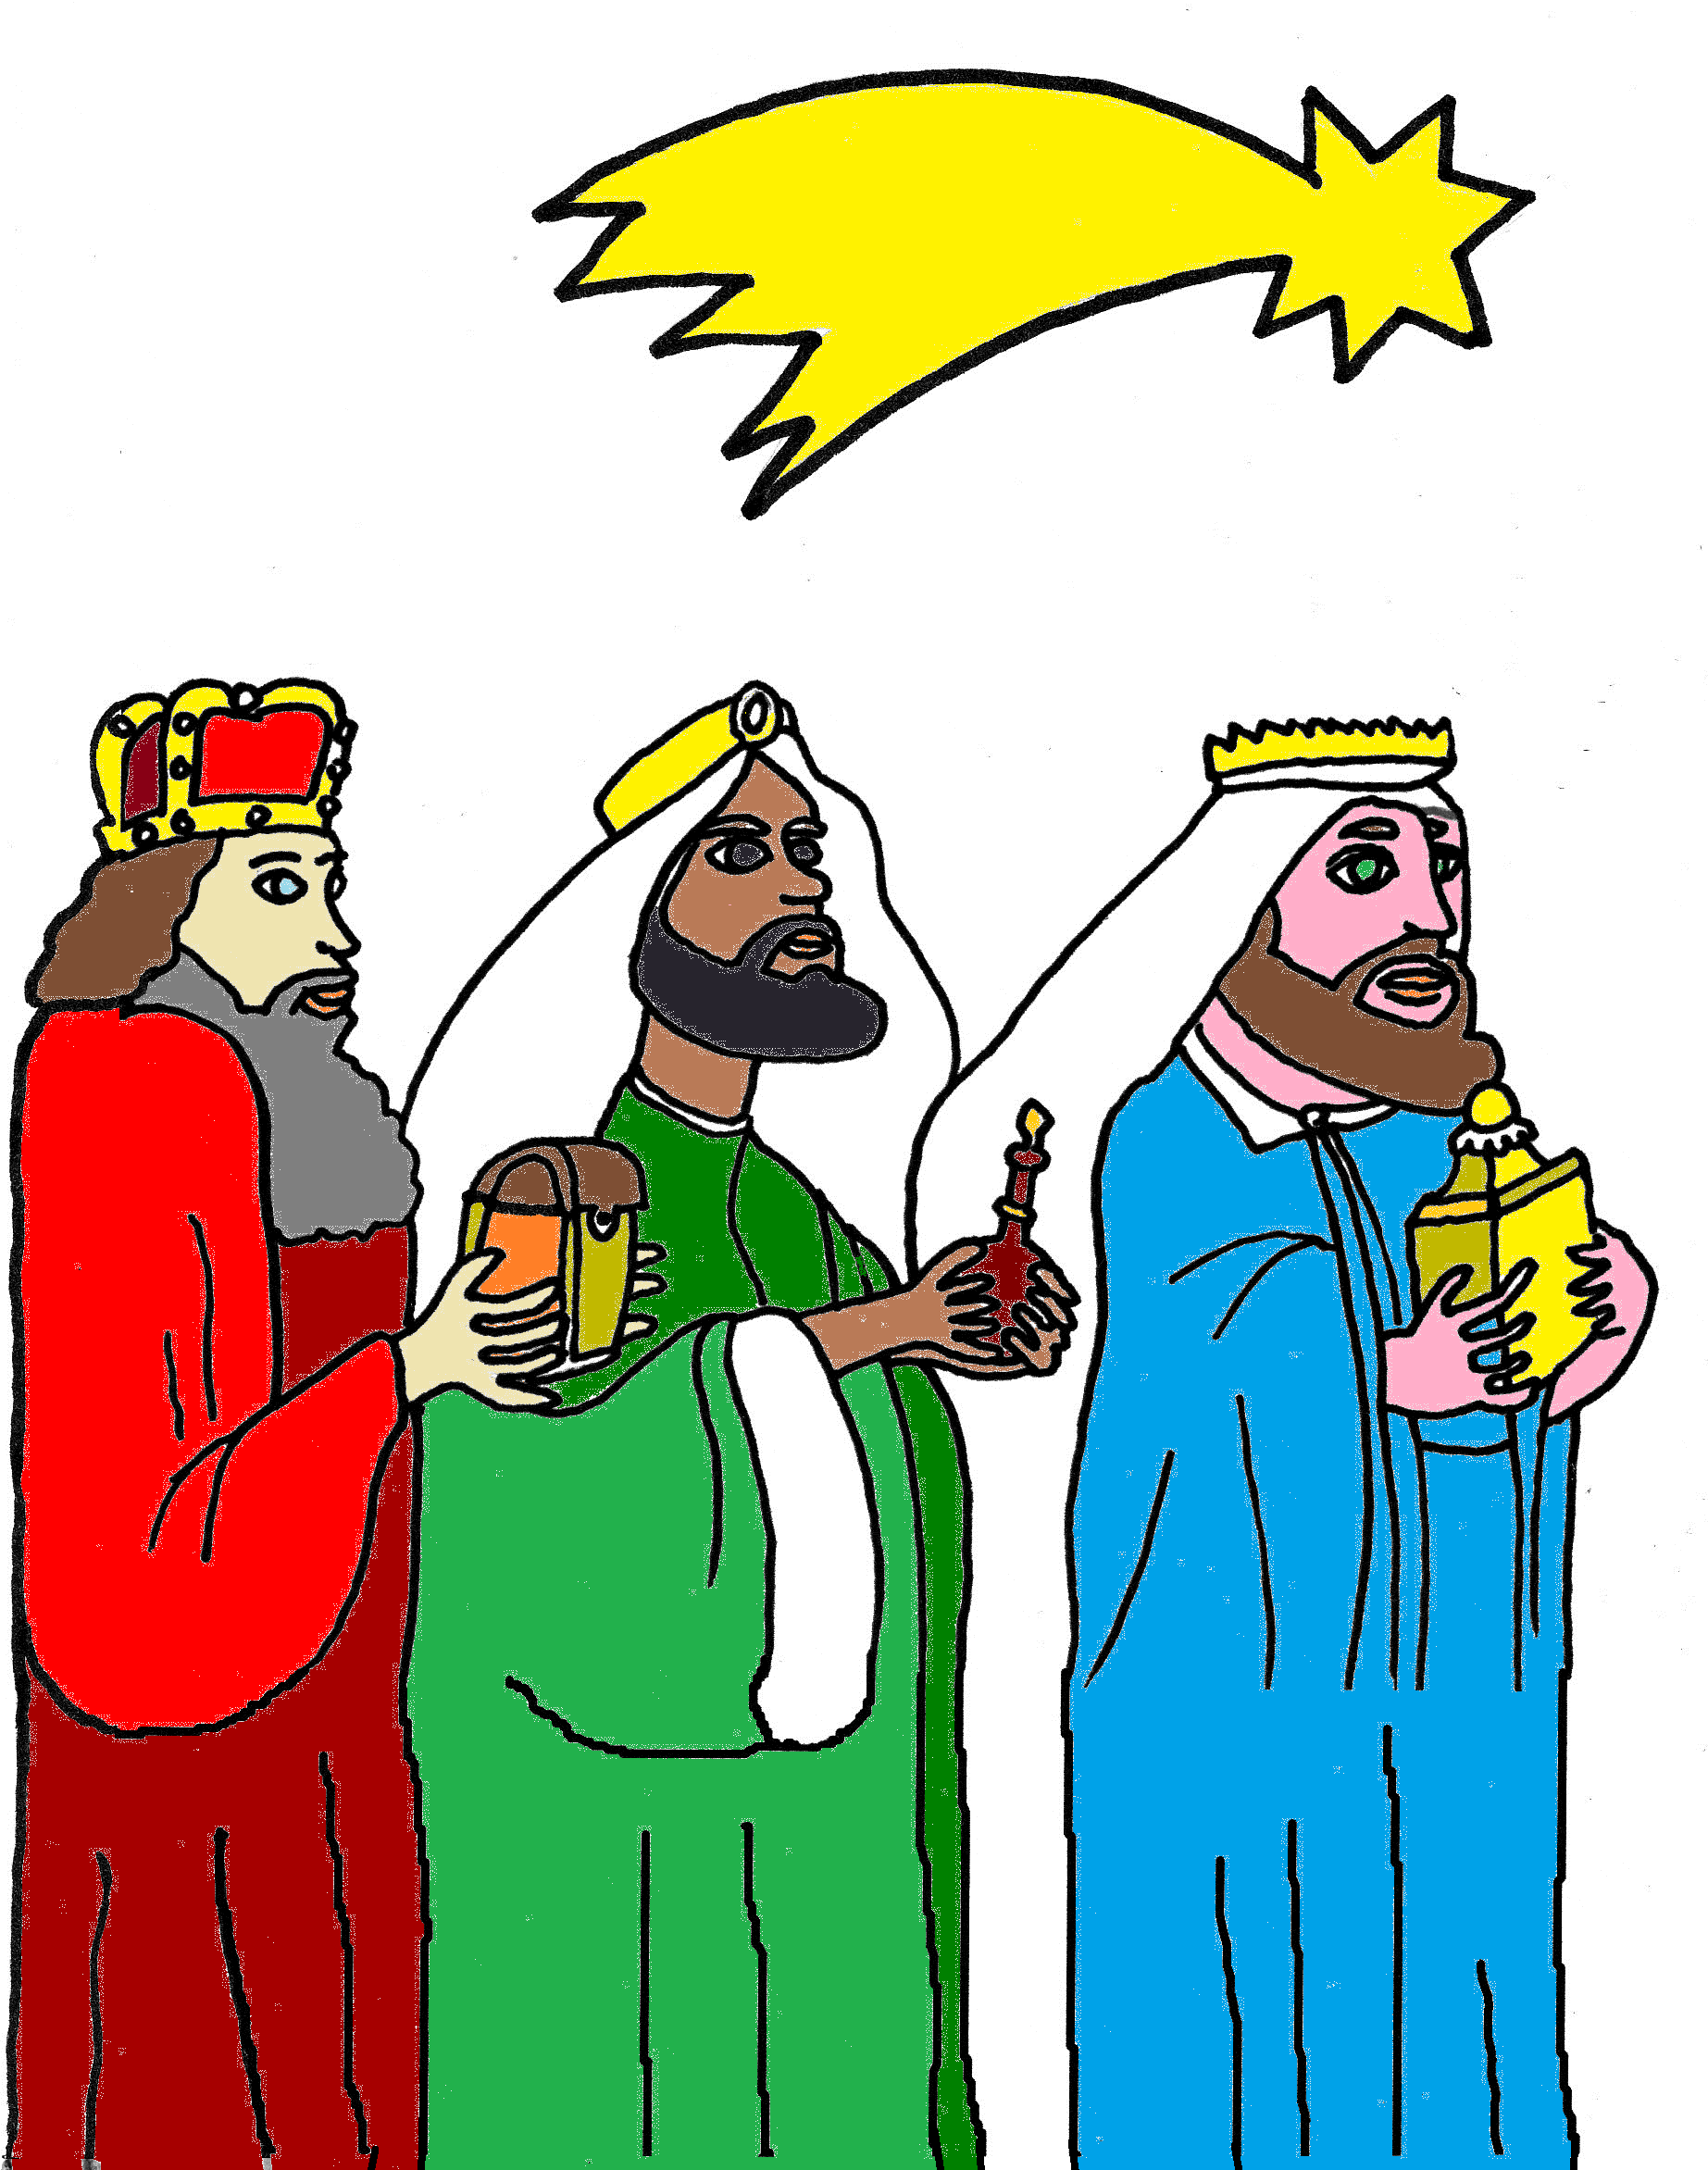 Feiertag Hl Drei Könige Bundesländer